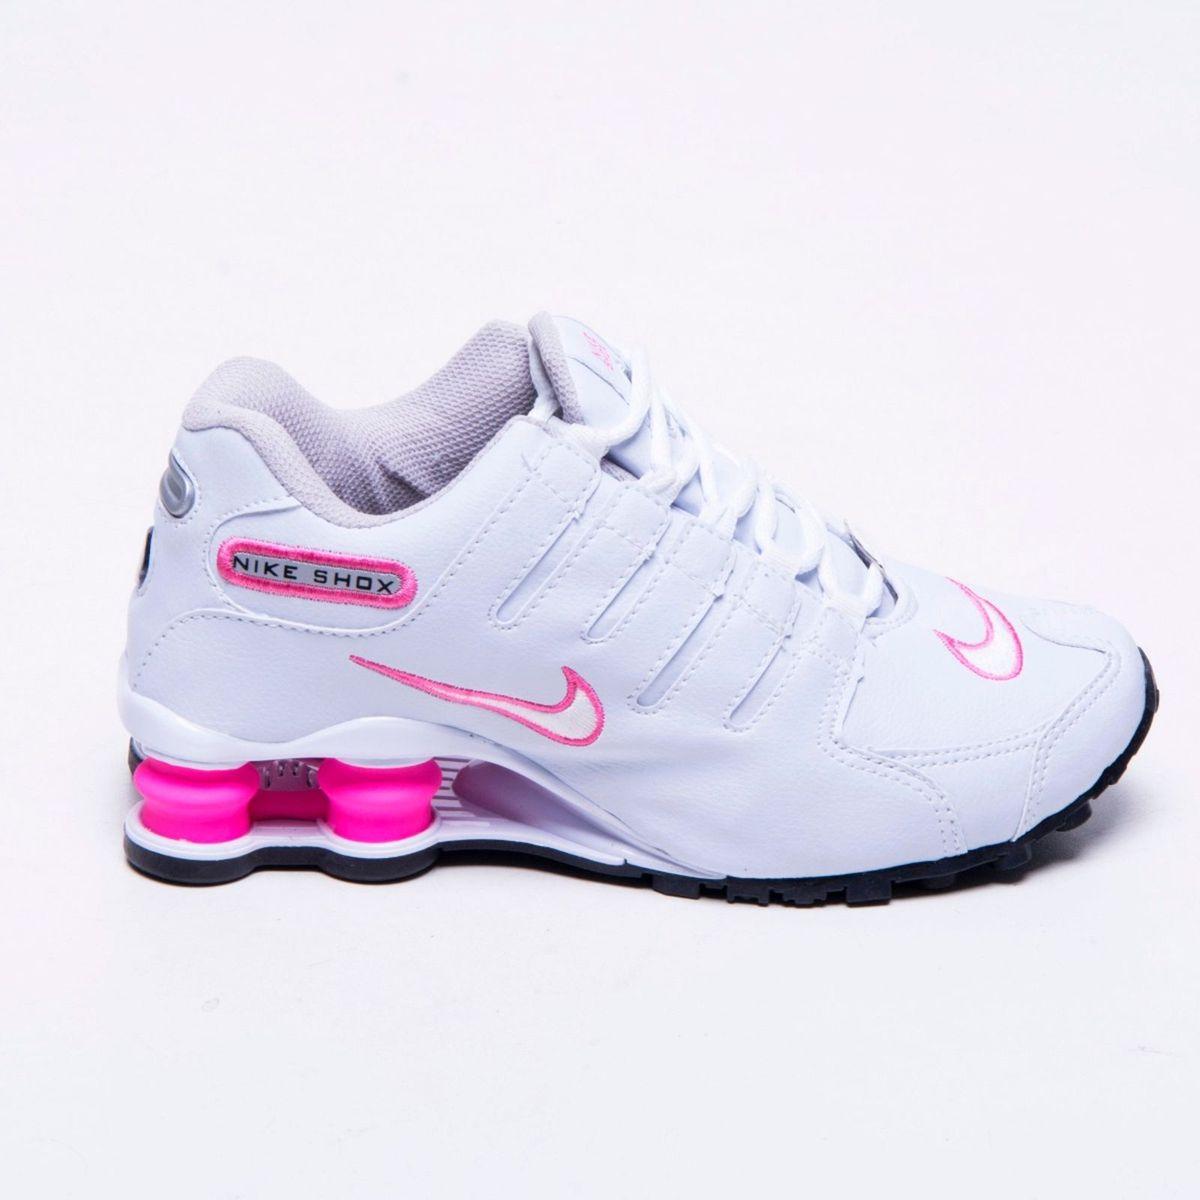 dd7874aaa9 Tenis Nike Shox Nz Feminino Numero 37